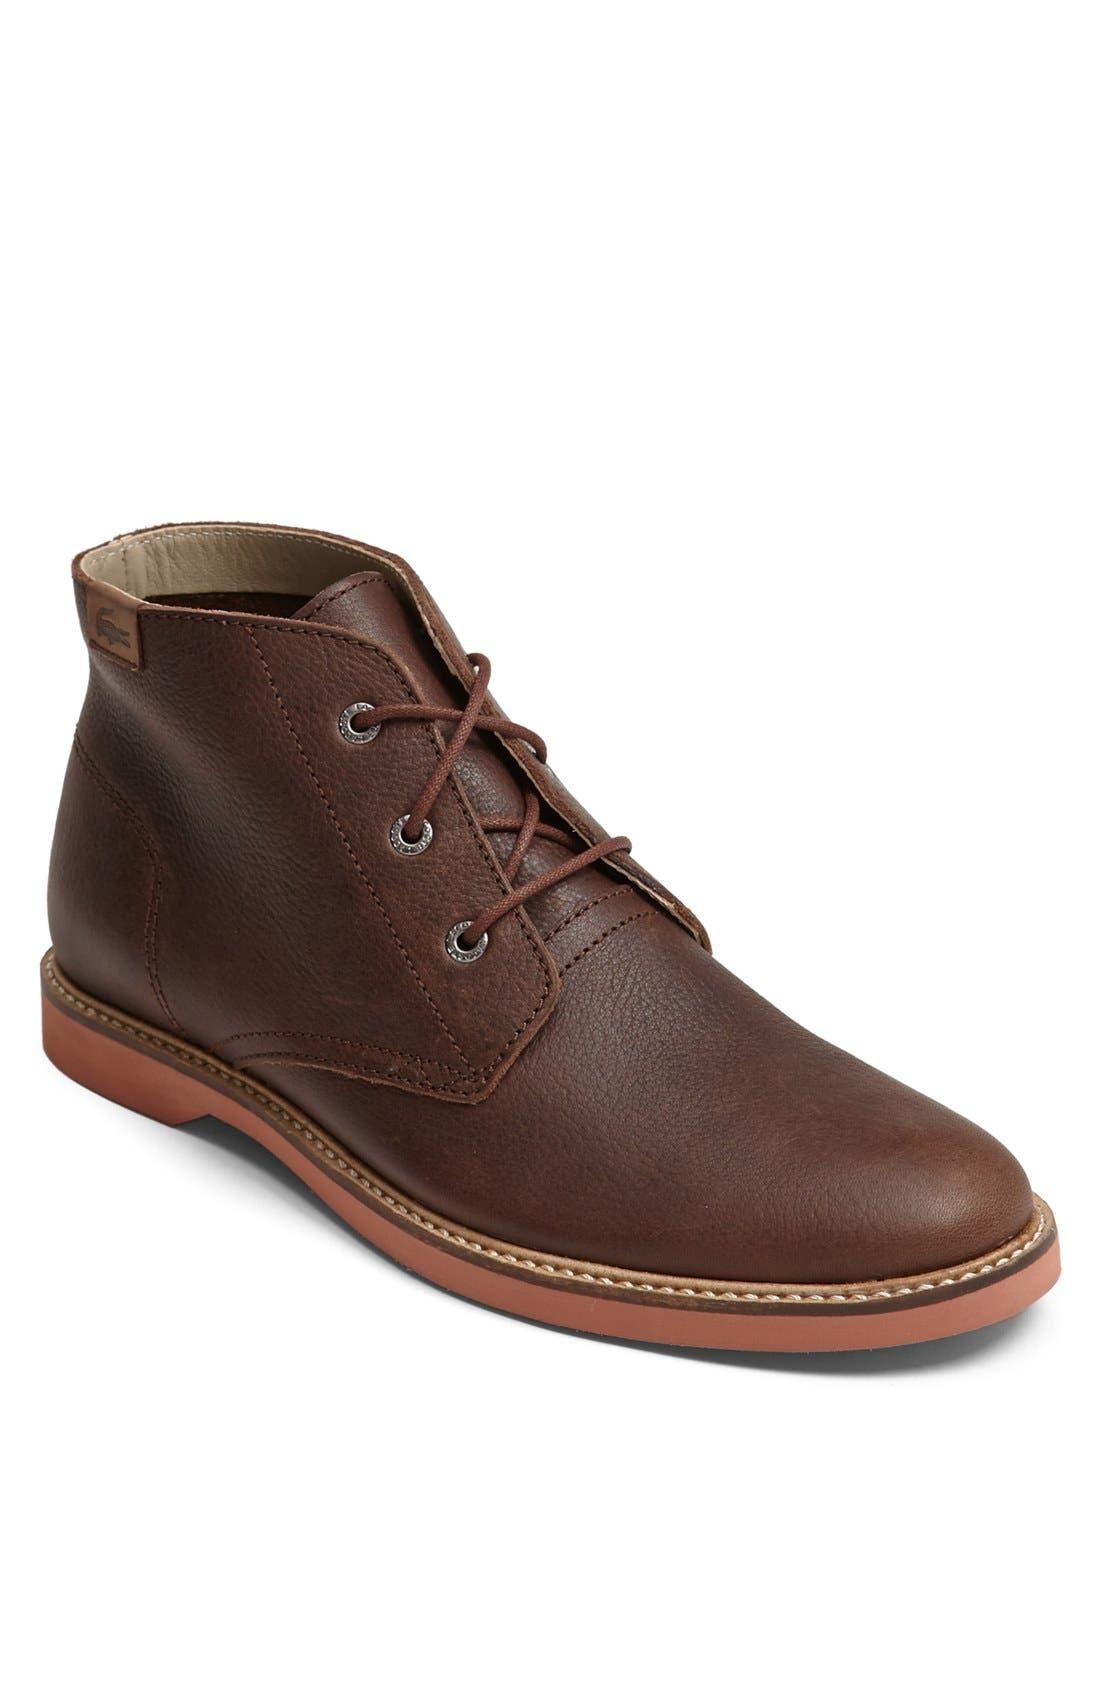 Alternate Image 1 Selected - Lacoste 'Sherbrooke Hi' Boot